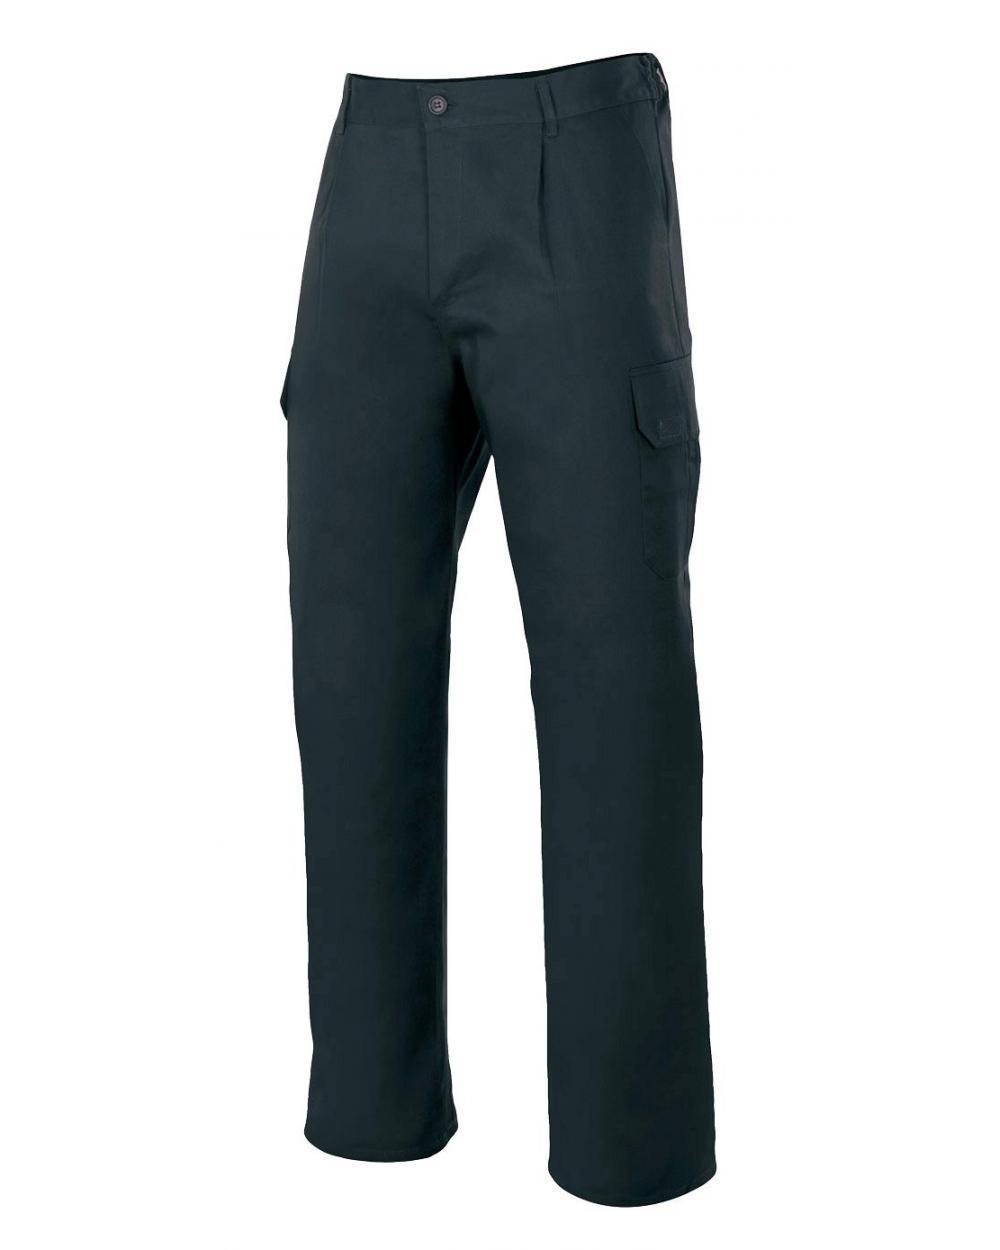 Comprar Pantalón  forrado multibolsillos serie 103006 online barato Negro